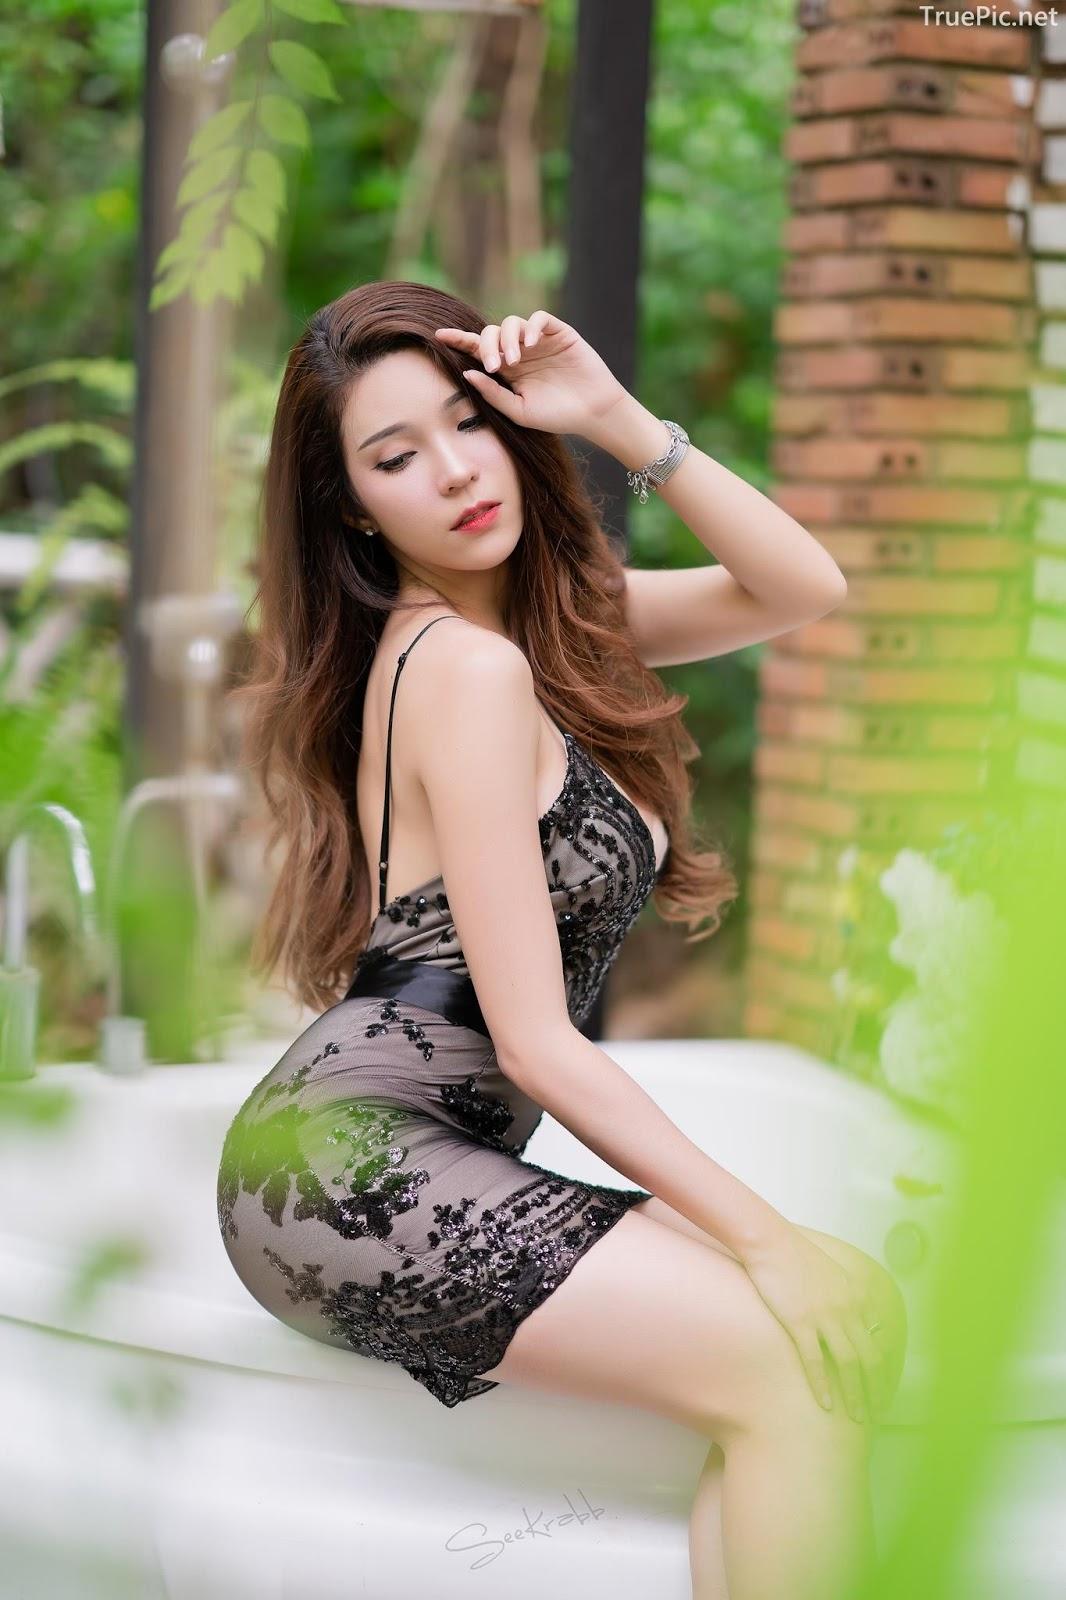 Thailand hot model - Janet Kanokwan Saesim - Black sexy garden - TruePic.net - Picture 6